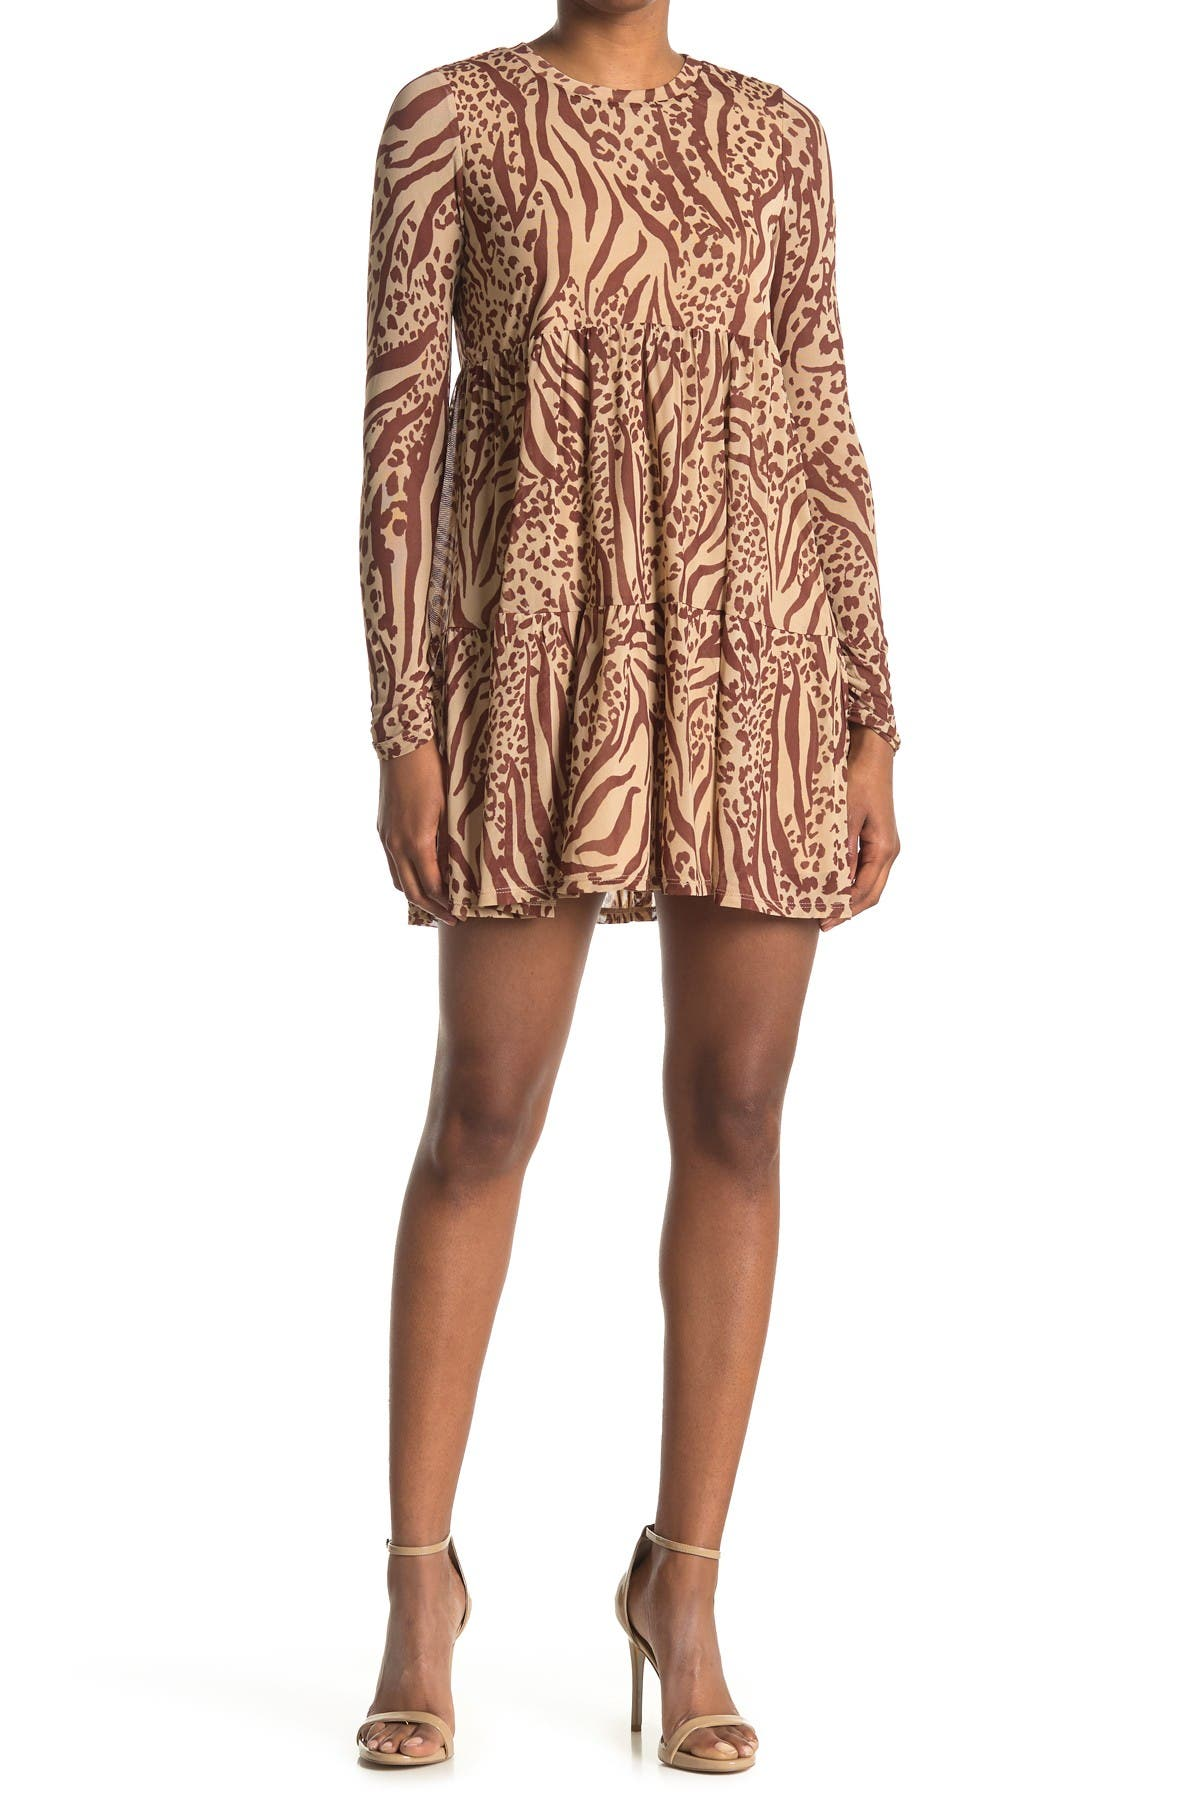 Image of AFRM Bell Long Sleeve Babydoll Dress